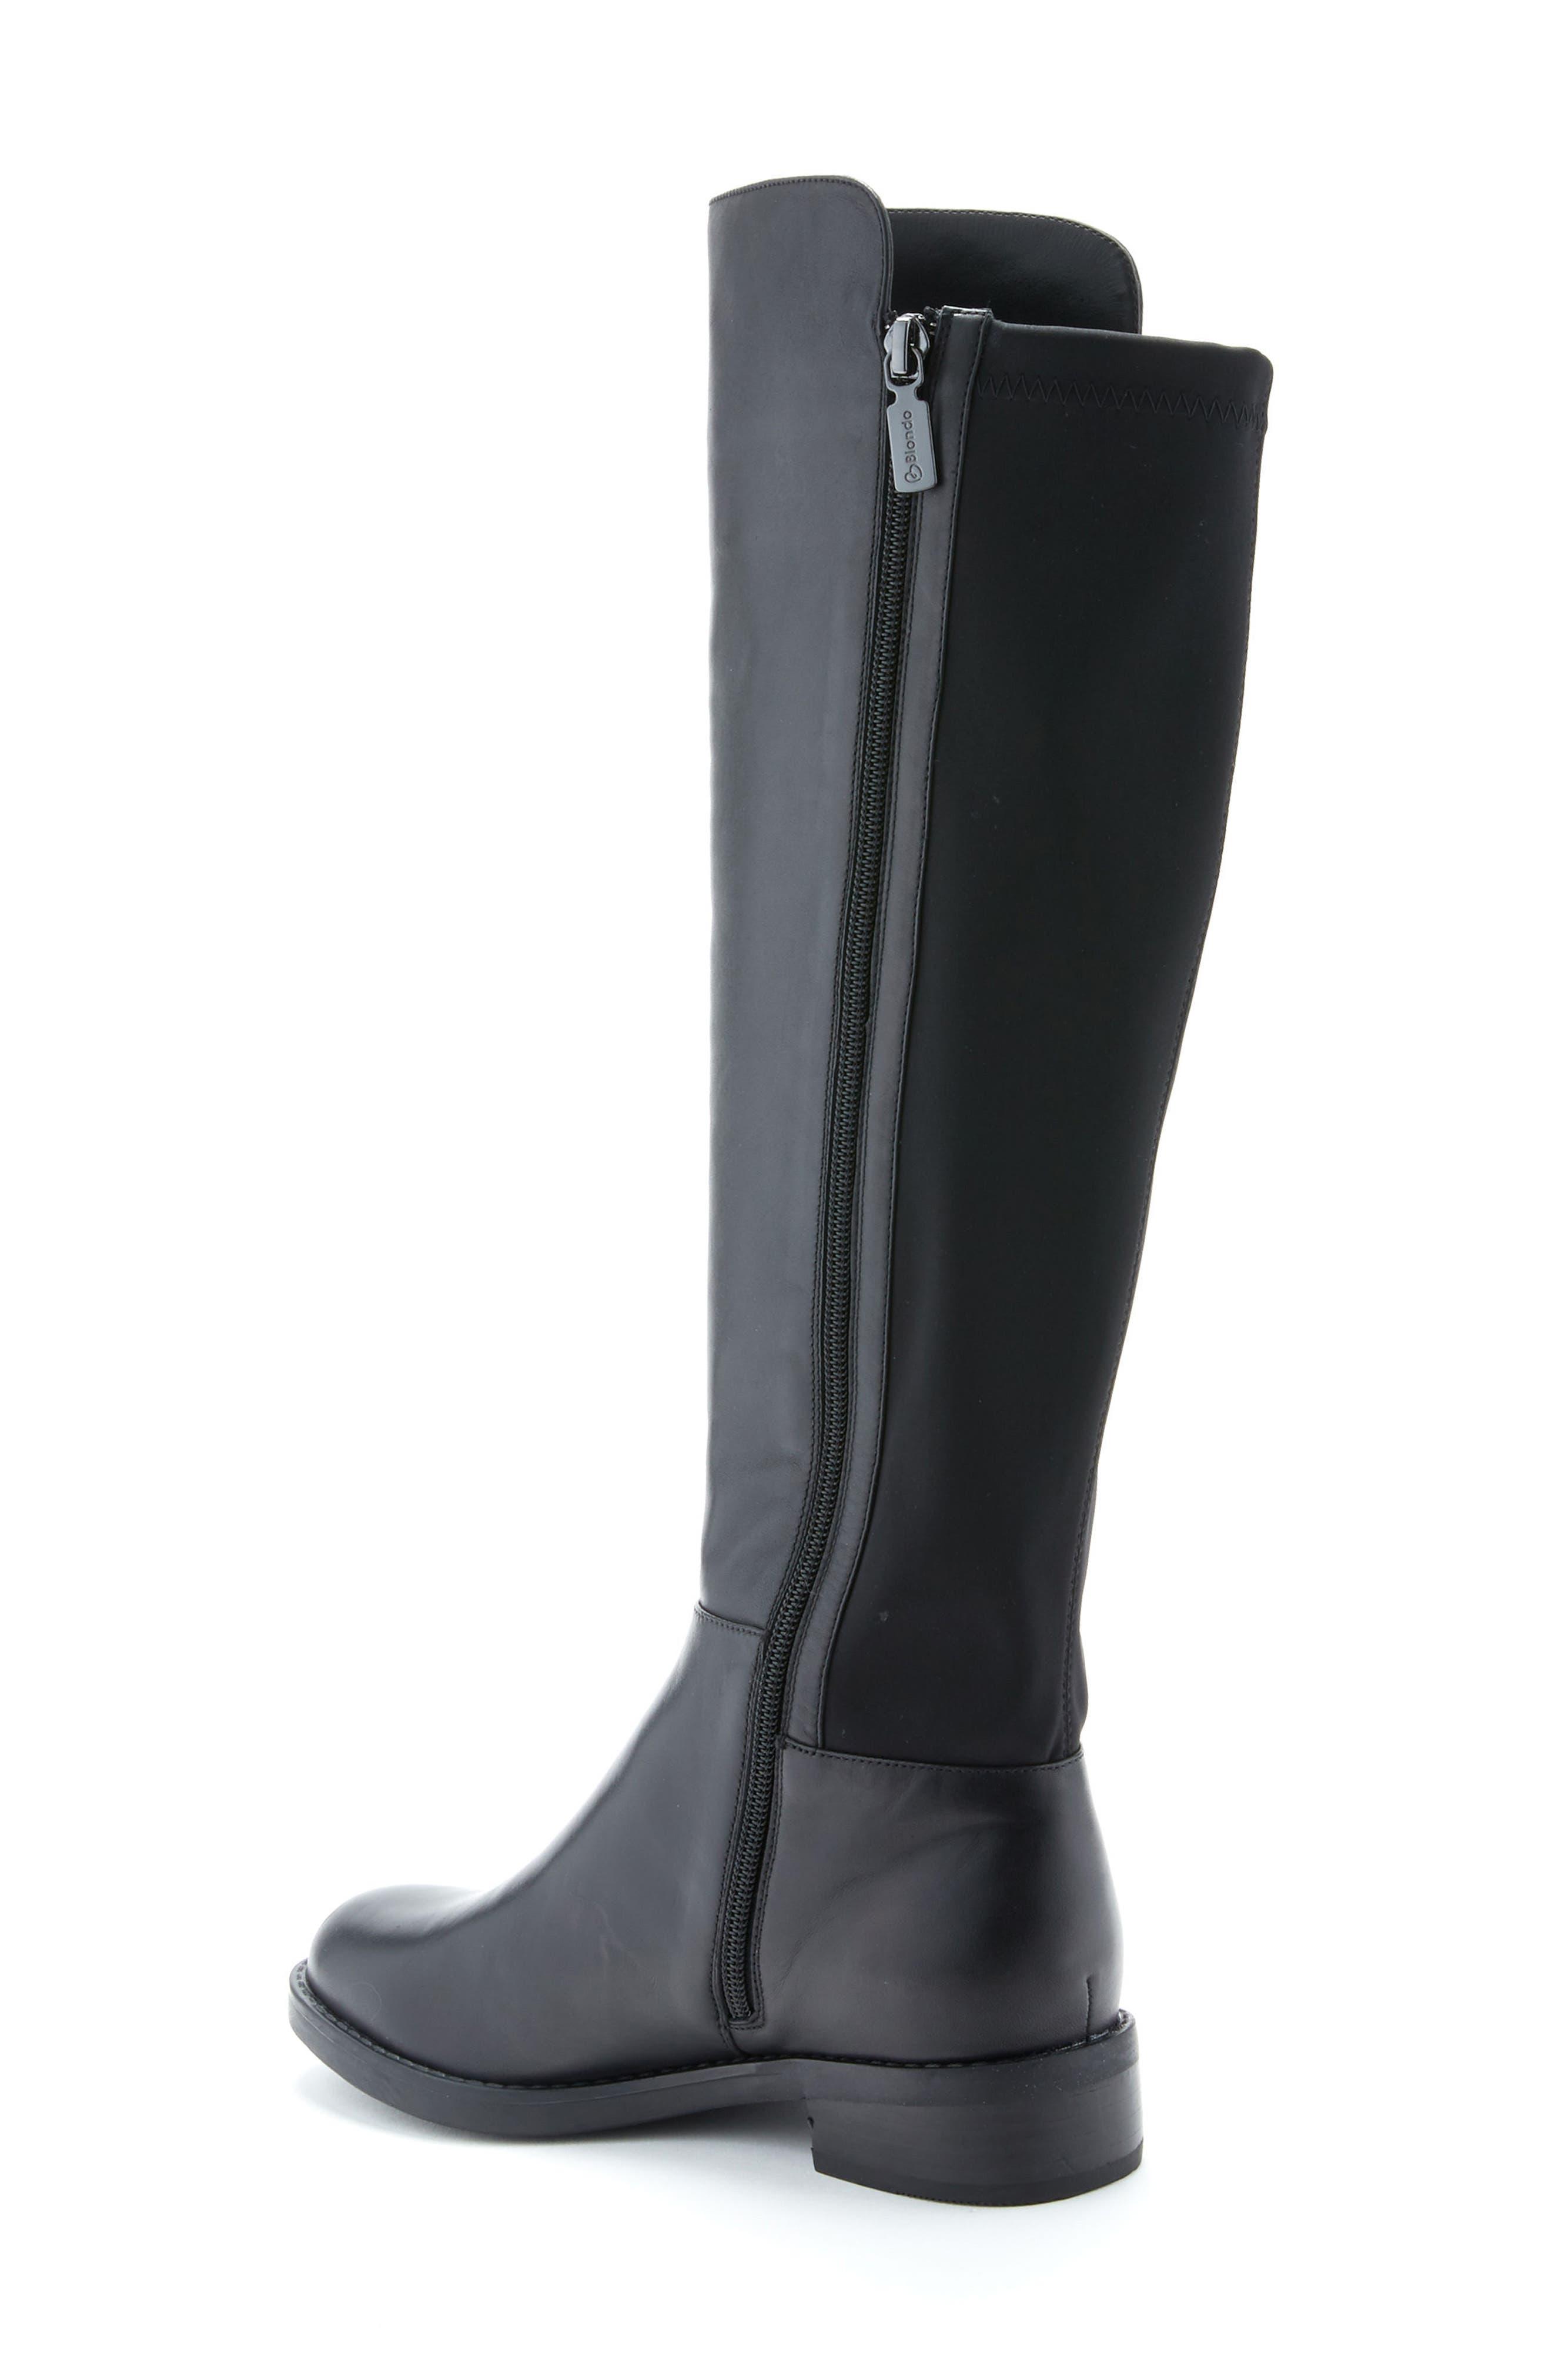 Ellie Waterproof Knee High Riding Boot,                             Alternate thumbnail 2, color,                             BLACK LEATHER